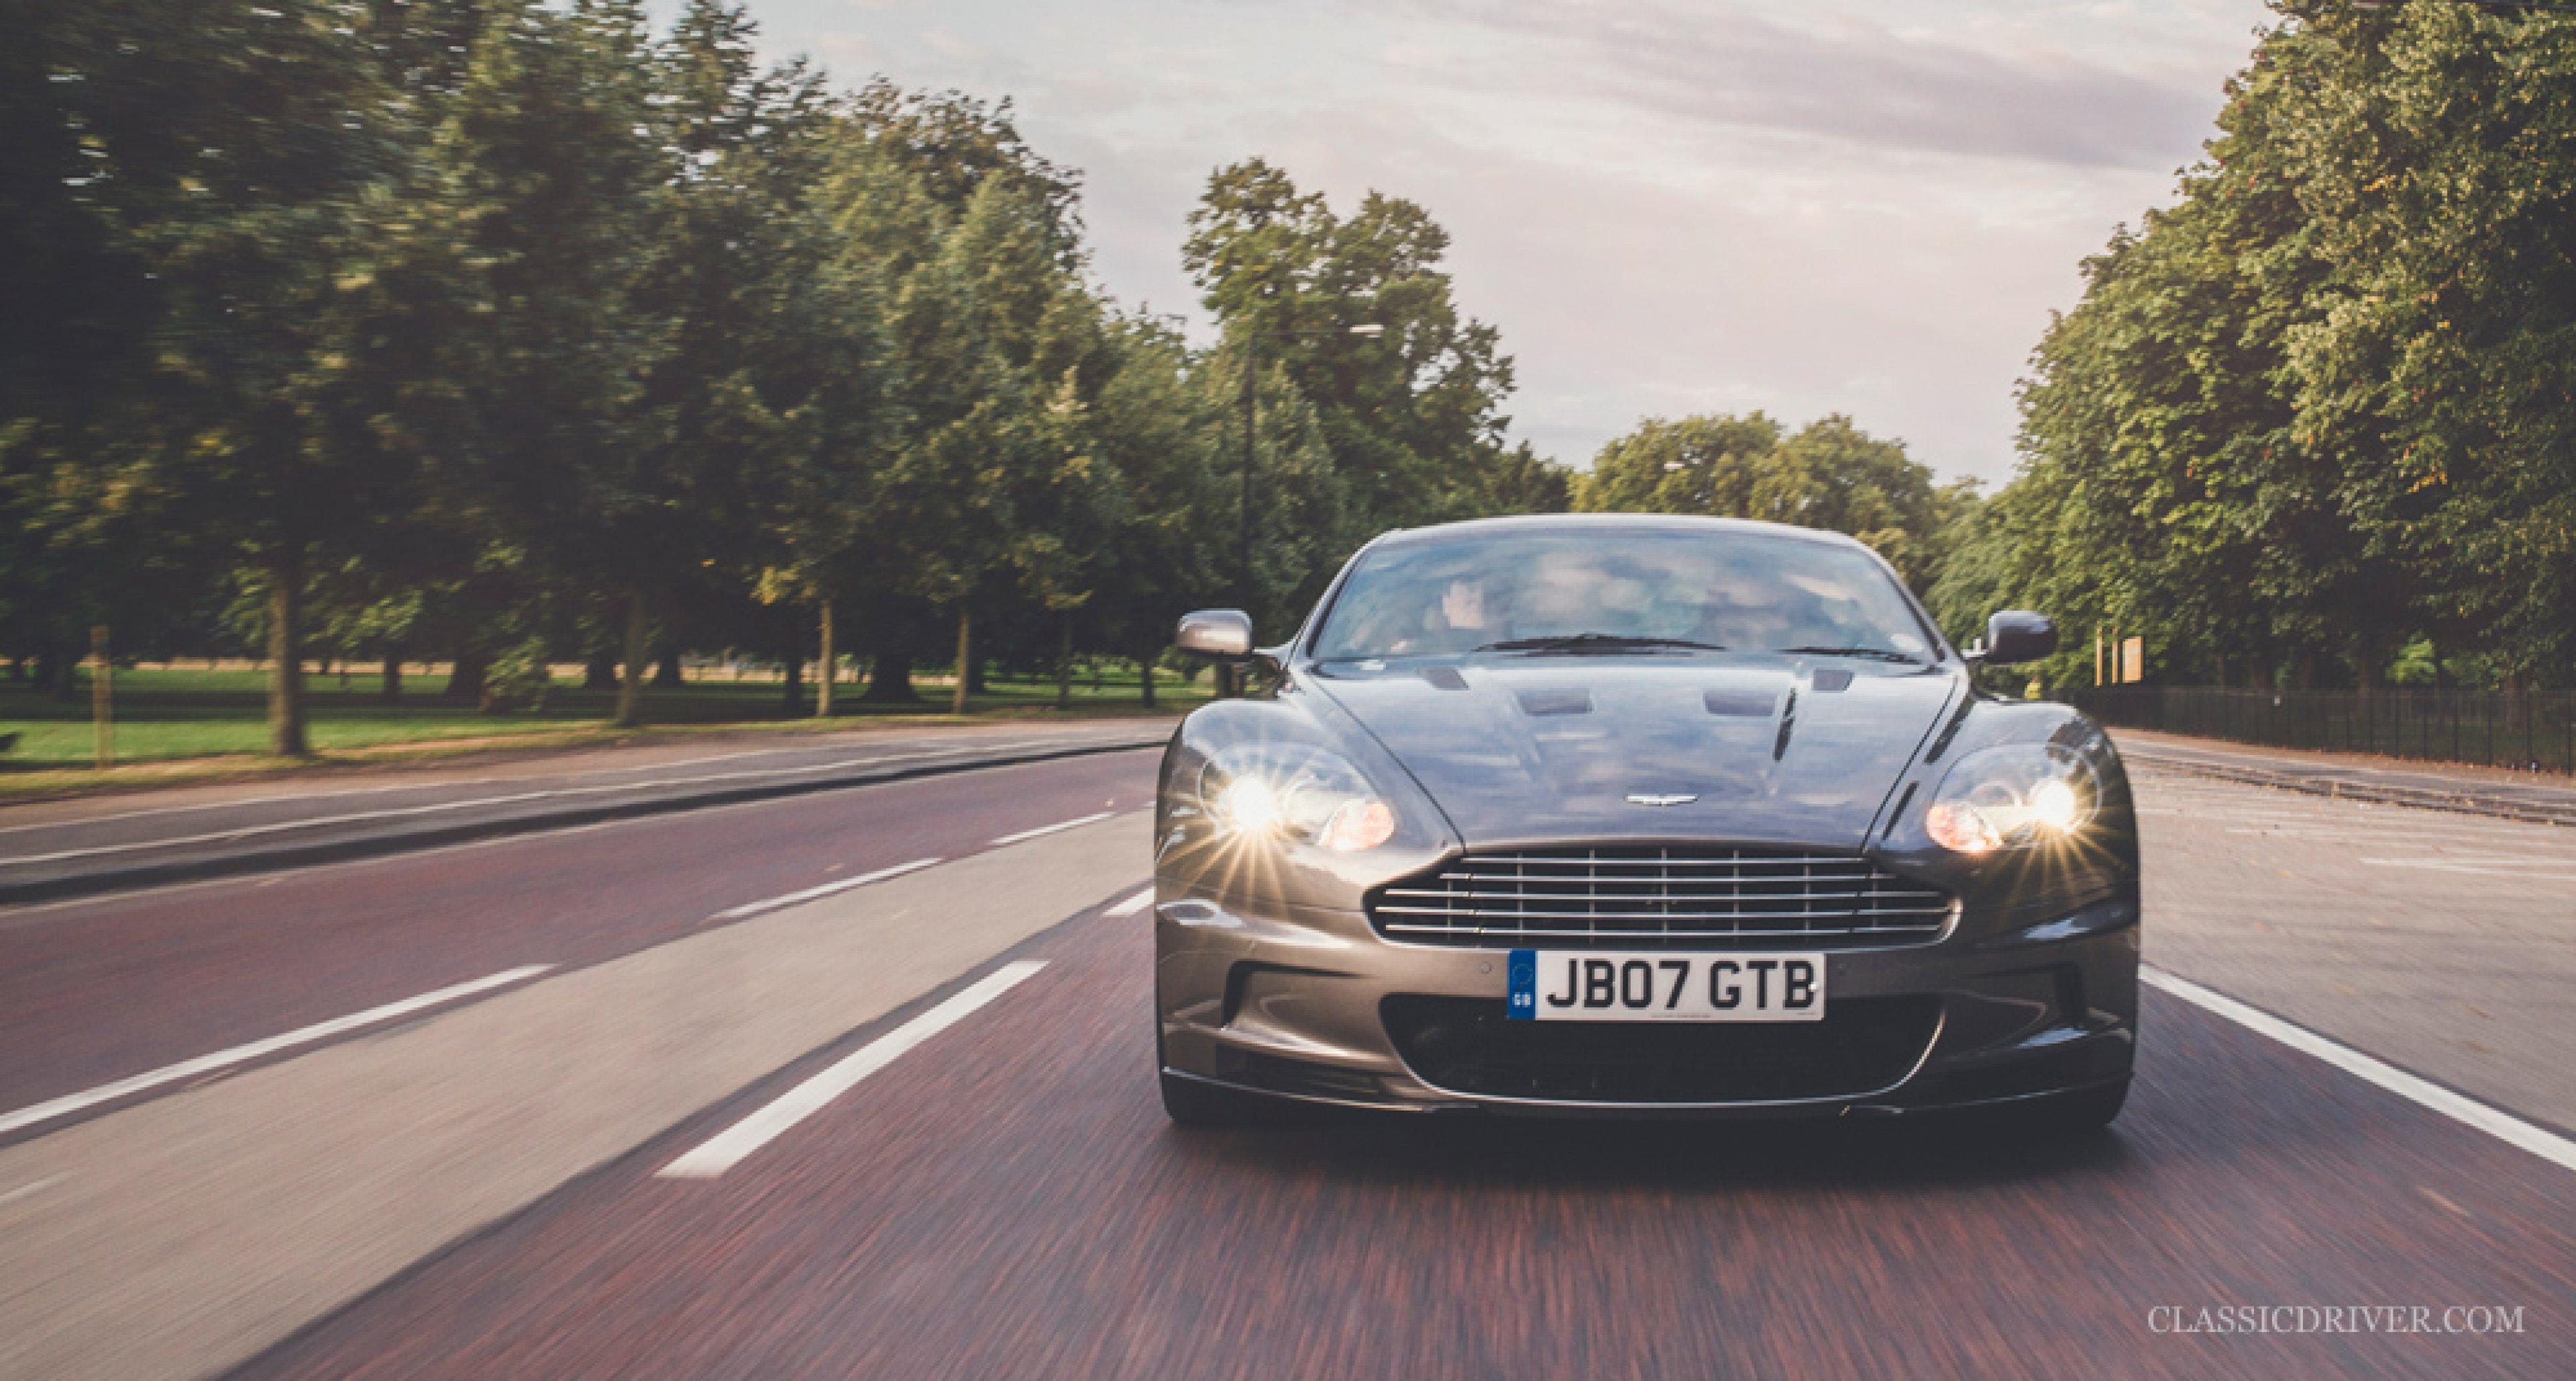 Brotherly Bond Why I Bought The Casino Royale Aston Martin